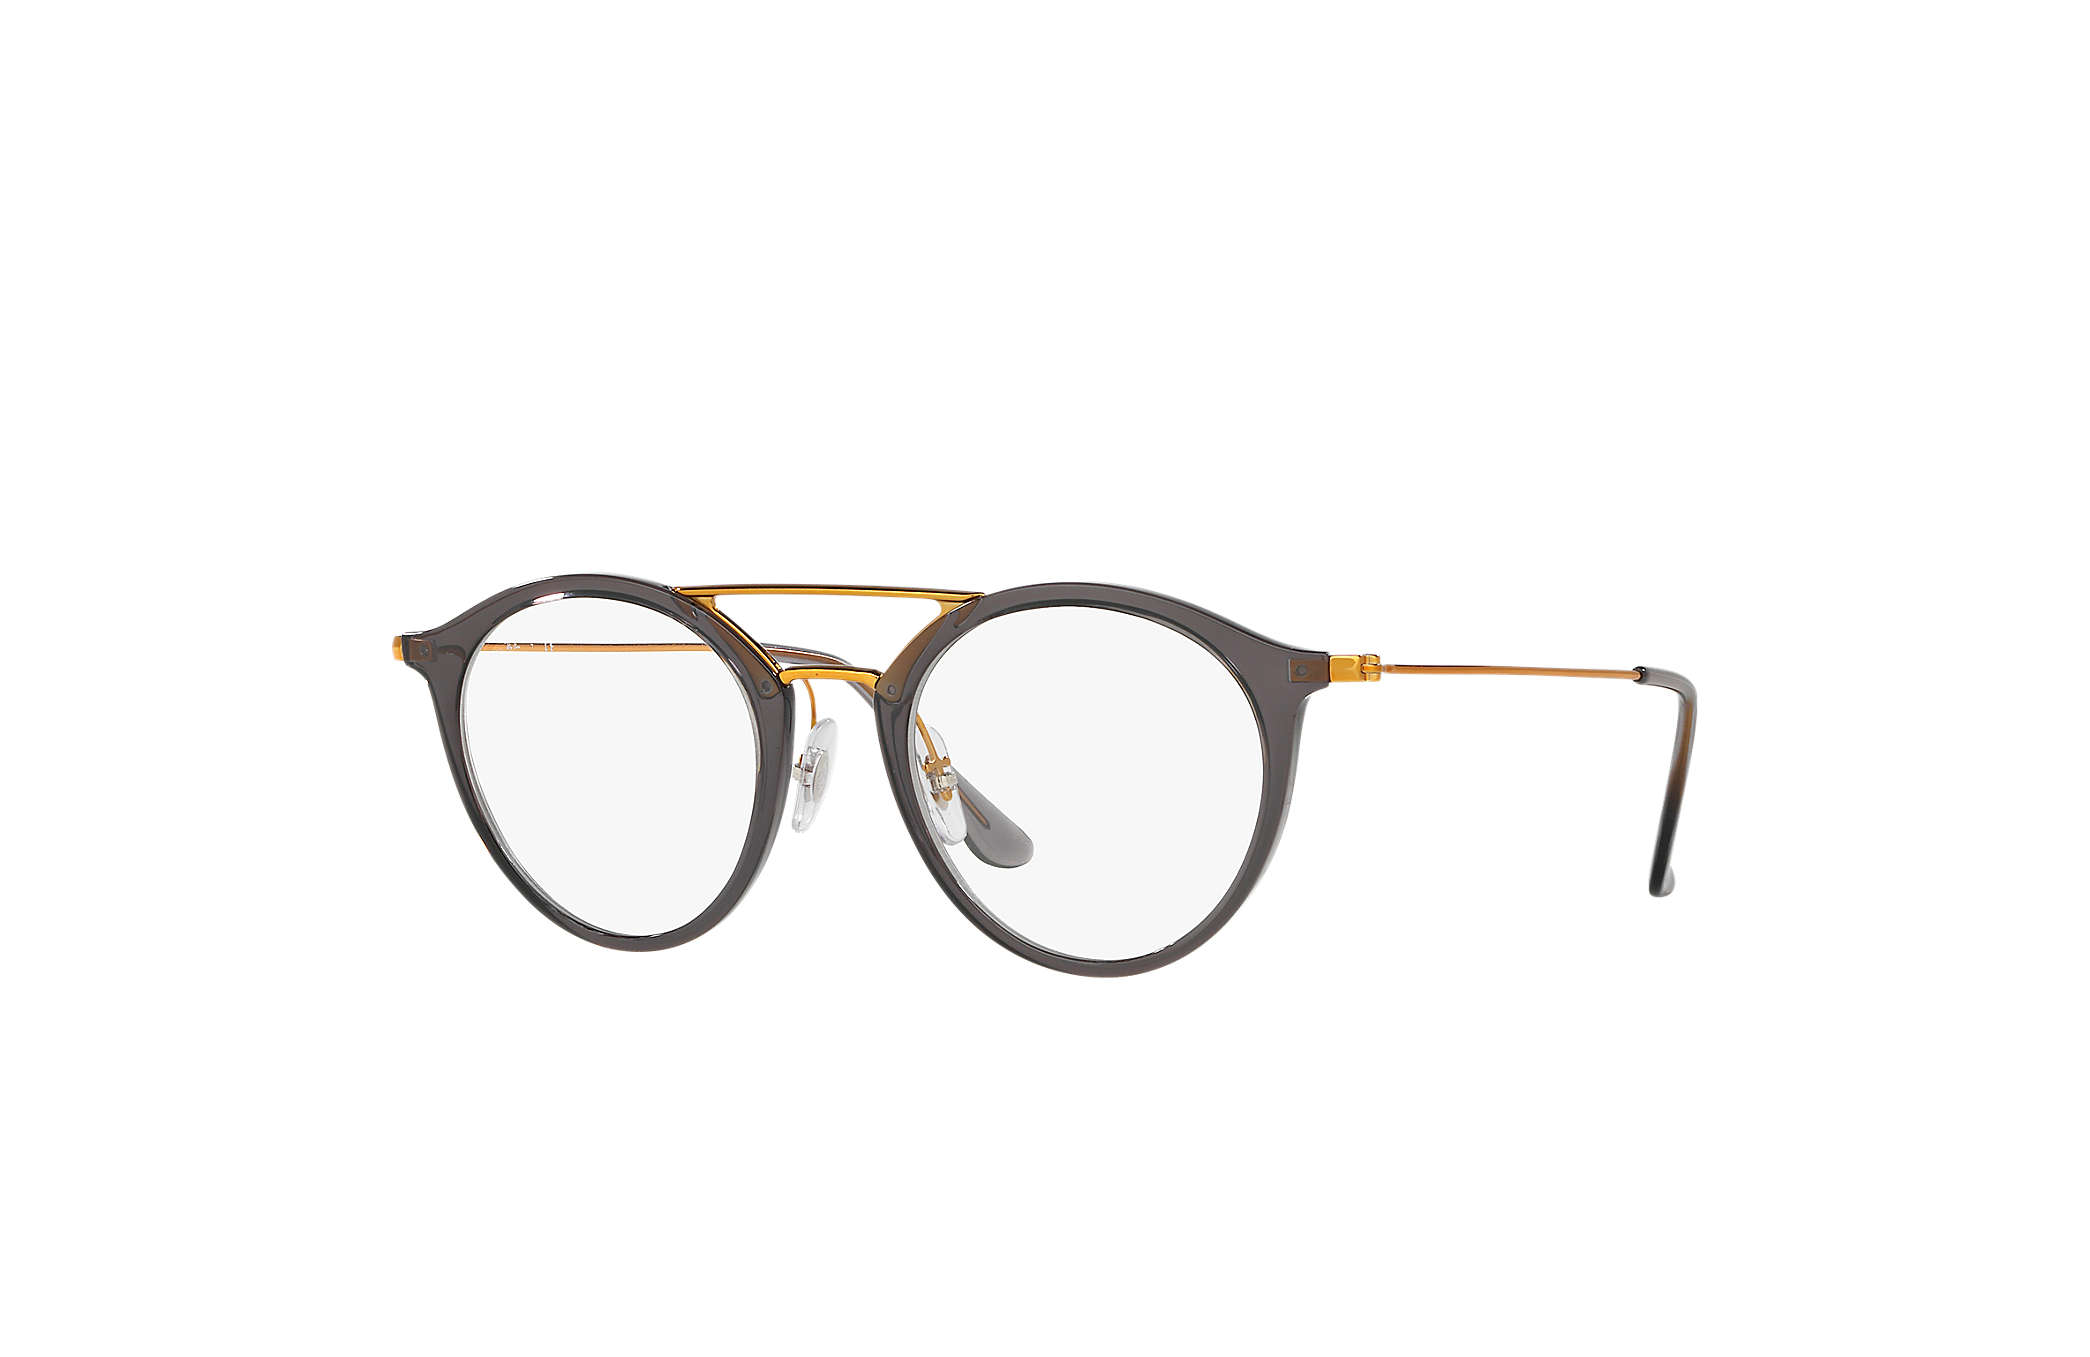 53007d27b9 Ray-Ban prescription glasses RB7097 Grey - Injected - 0RX7097563347 ...